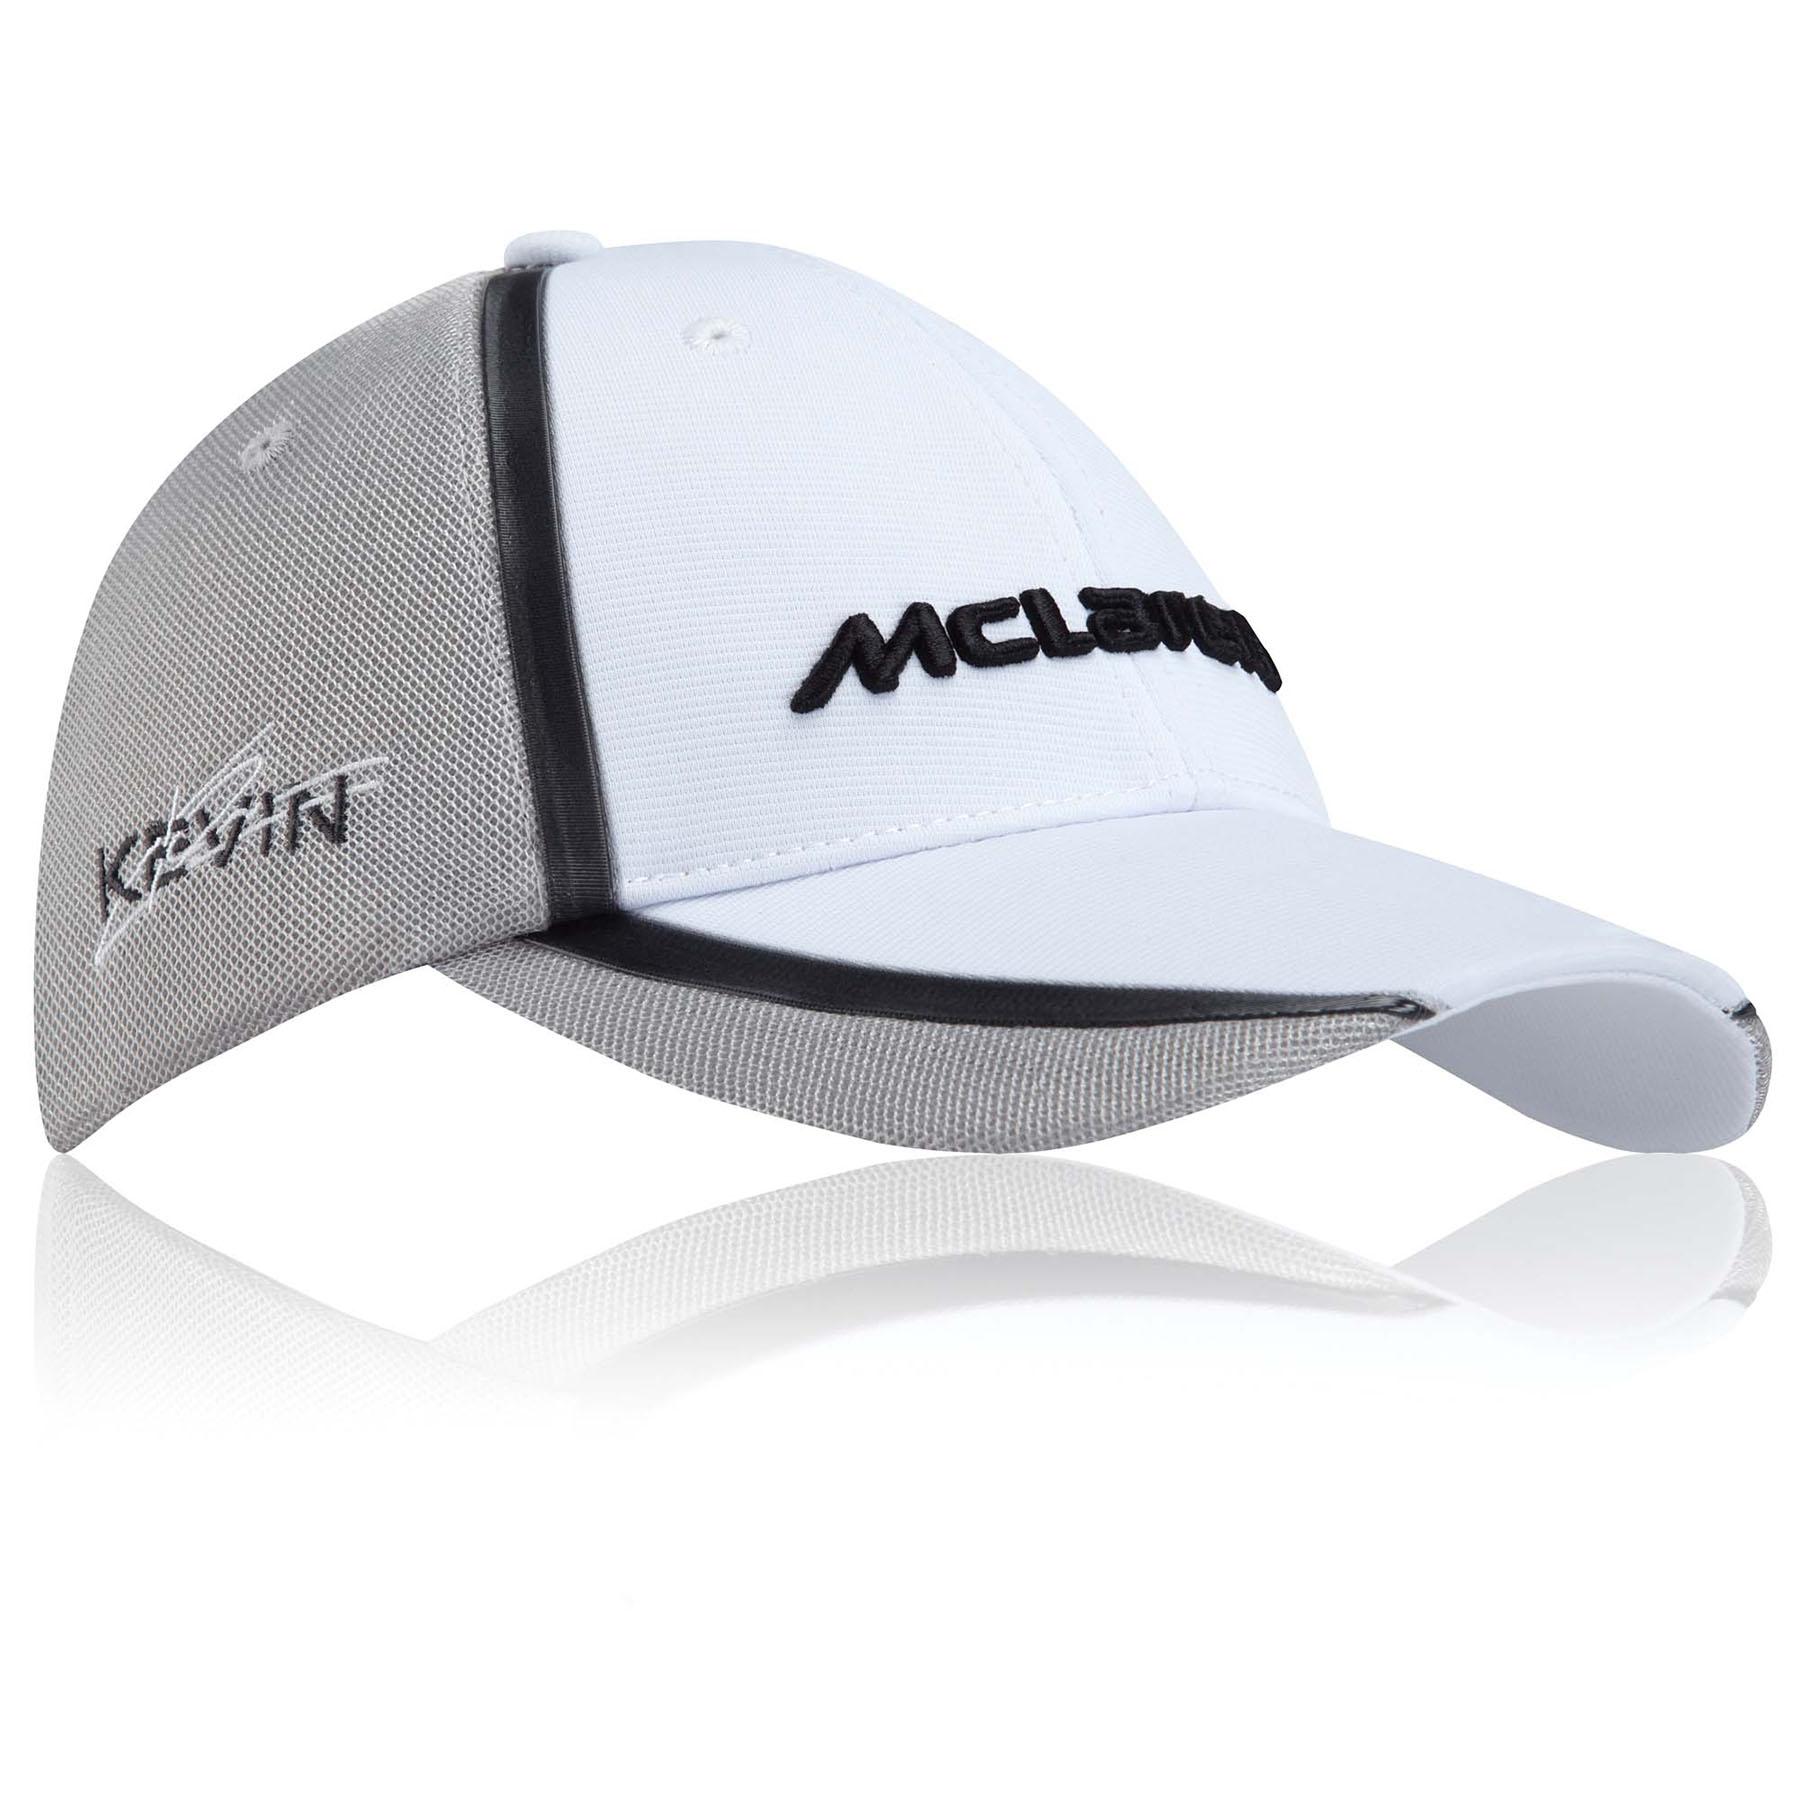 McLaren Mercedes Kevin Magnussen Drivers Team Cap